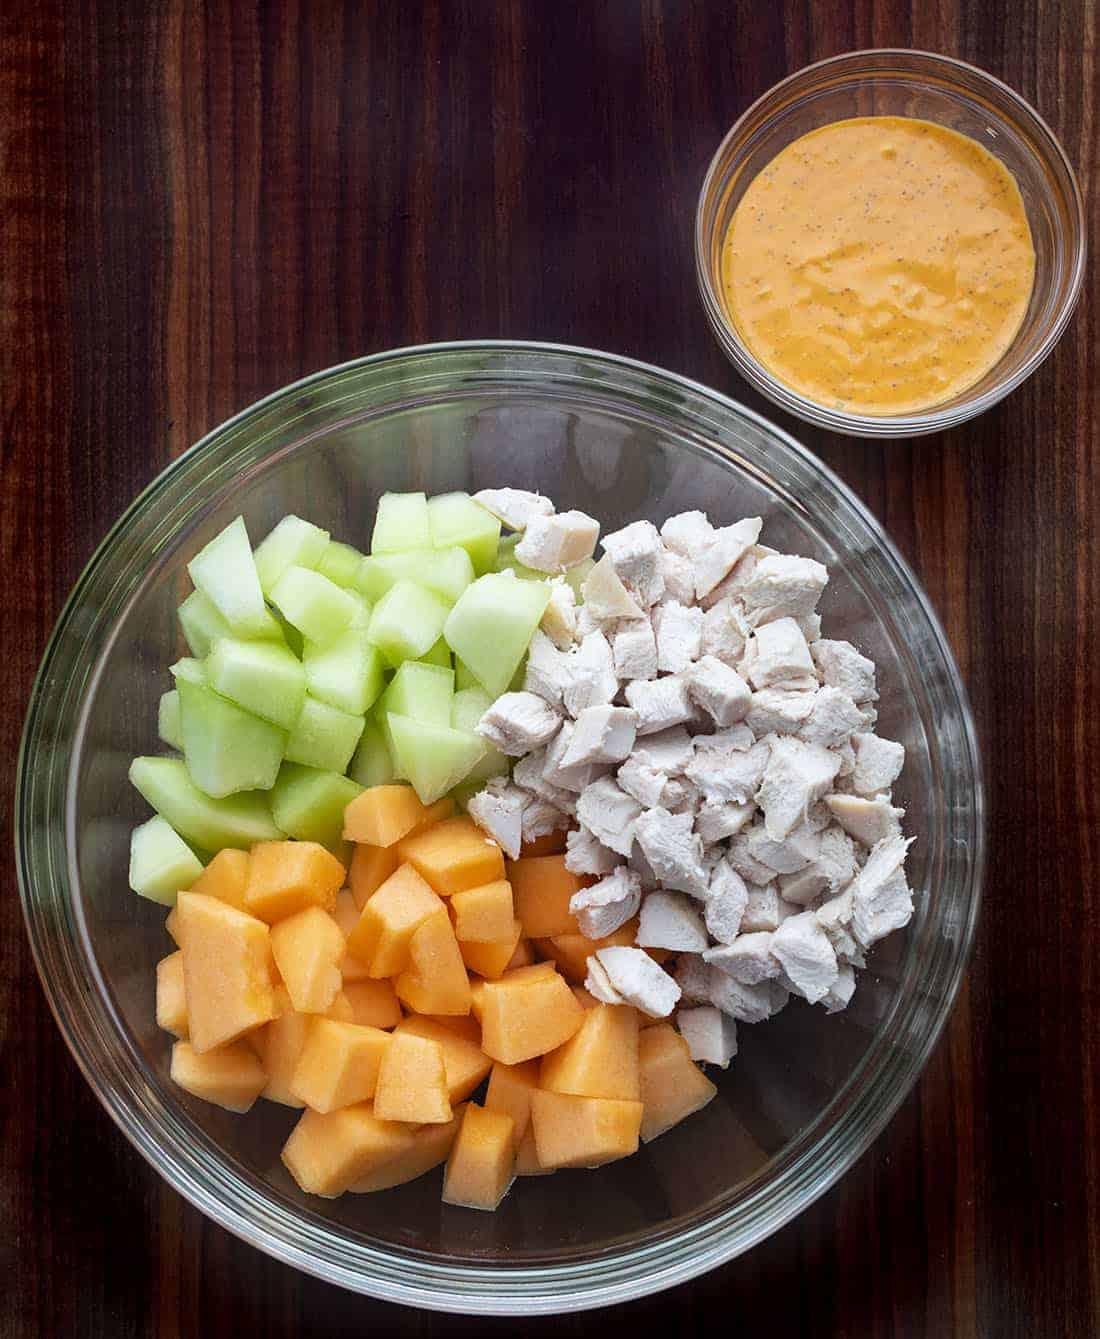 Raw Ingredients for Cantaloupe Honey Dew Salad - Melon Salad